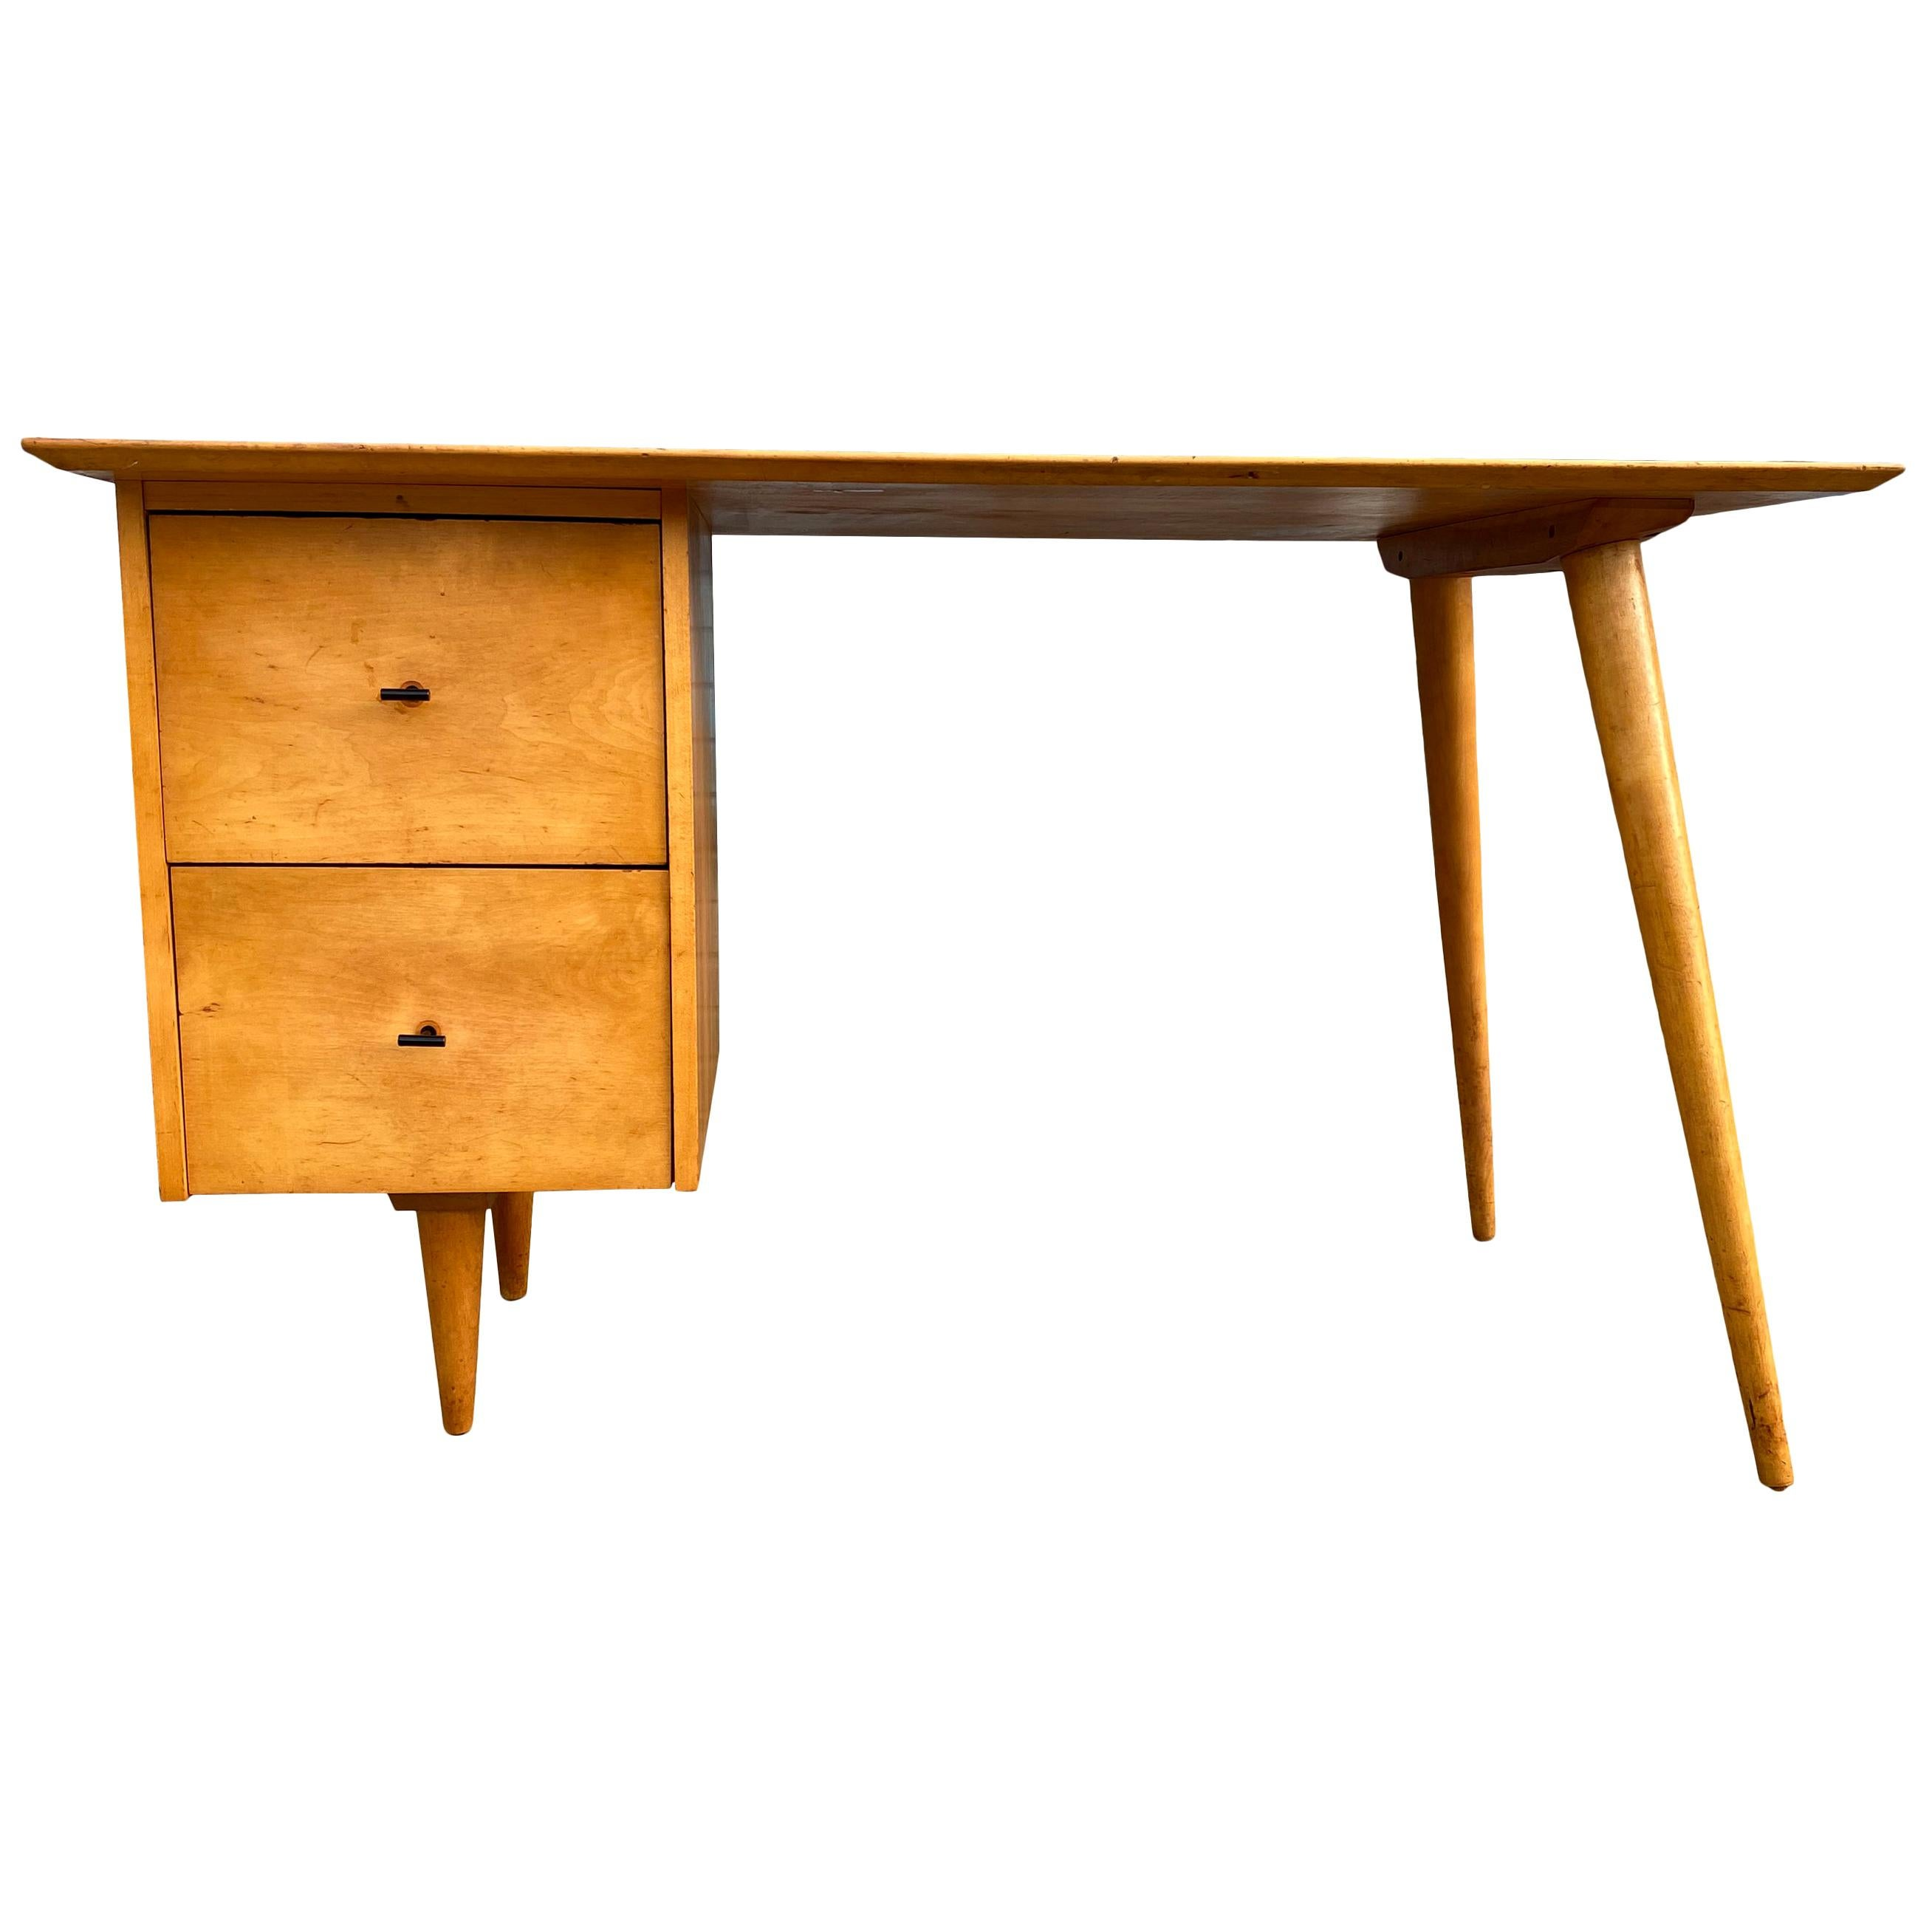 Midcentury Paul McCobb #1560 Double Drawer Desk Blonde Maple Finish T Pulls